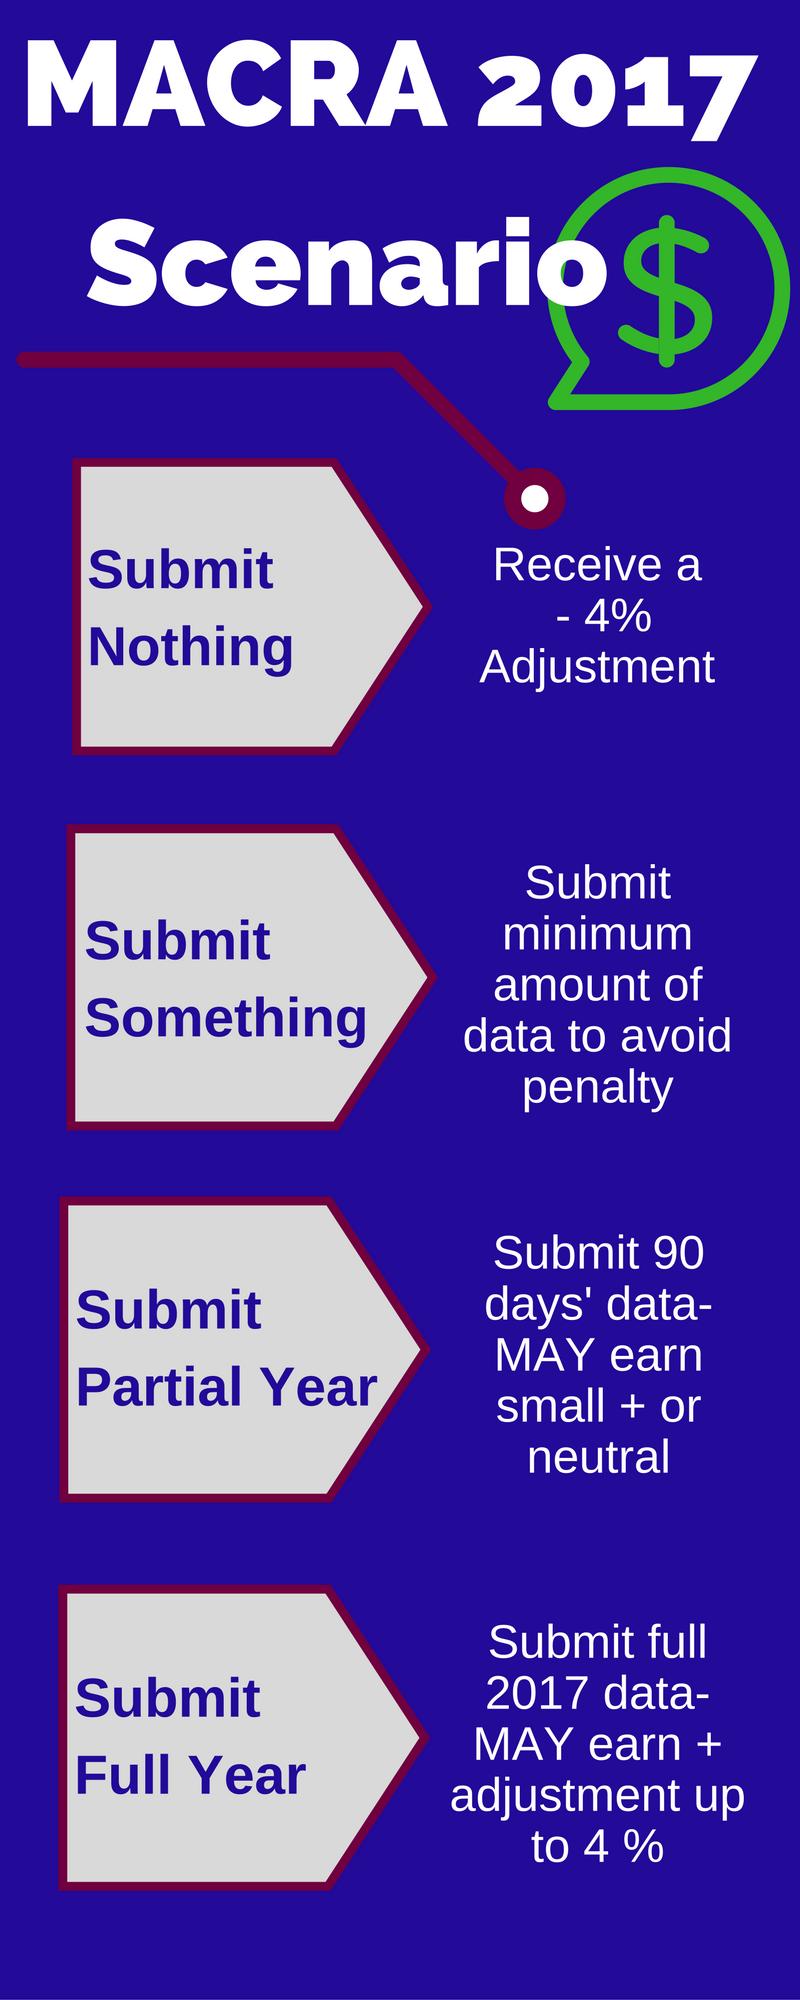 Info Services, Inc. MACRA 2017 Scenarios